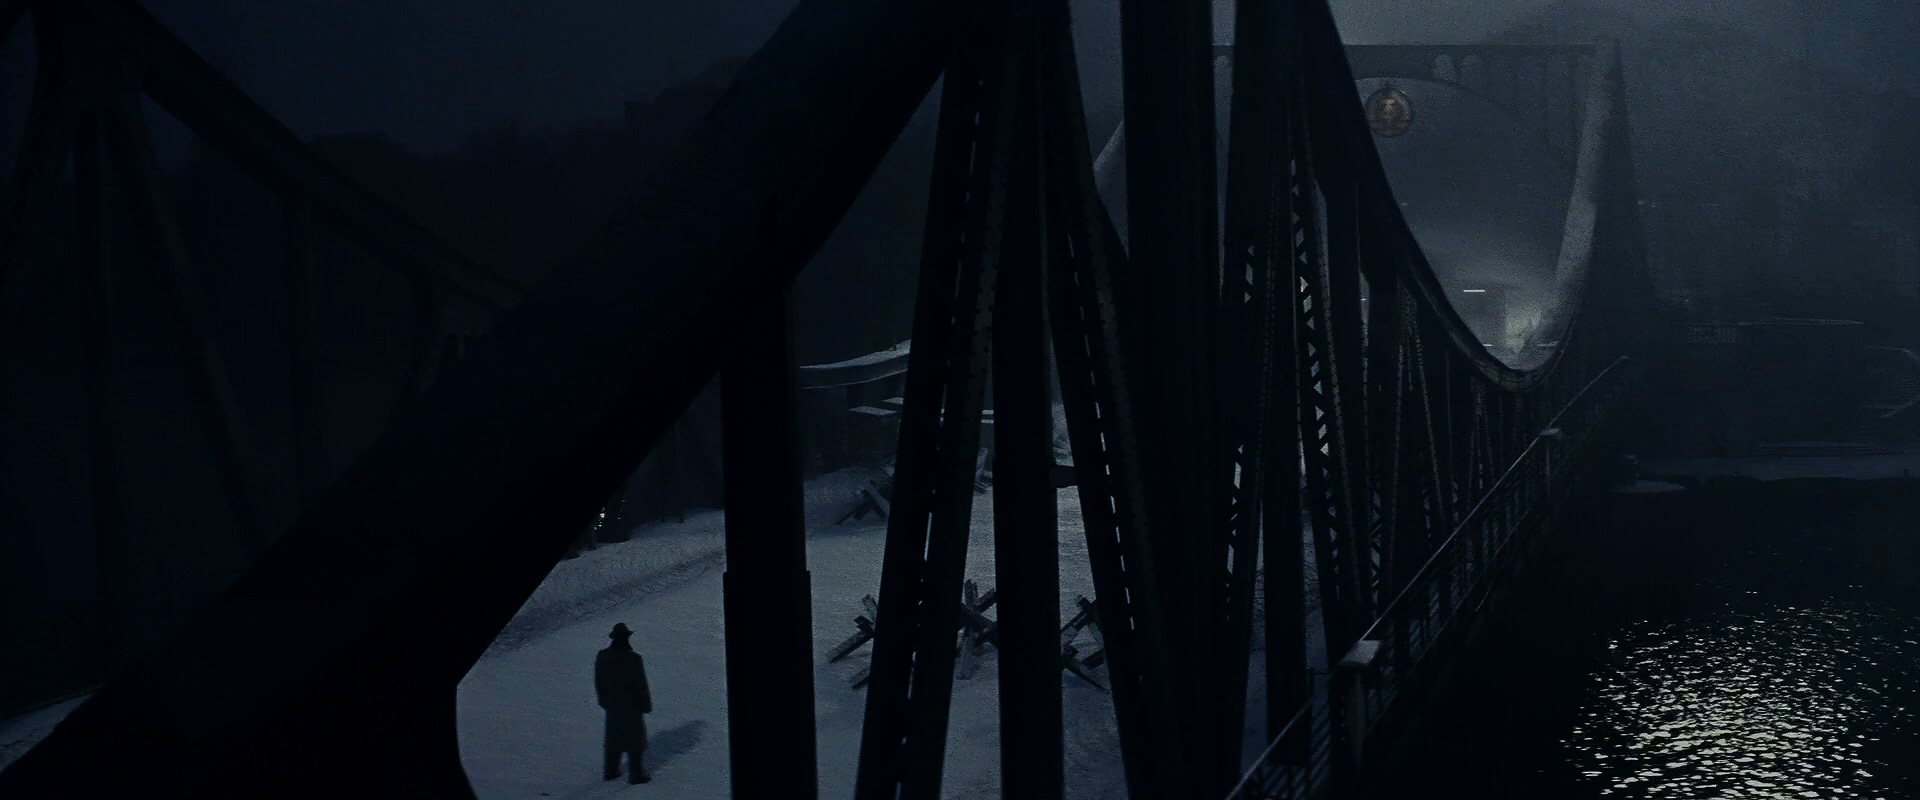 Tom Hanks in Bridge of Spies (2015)